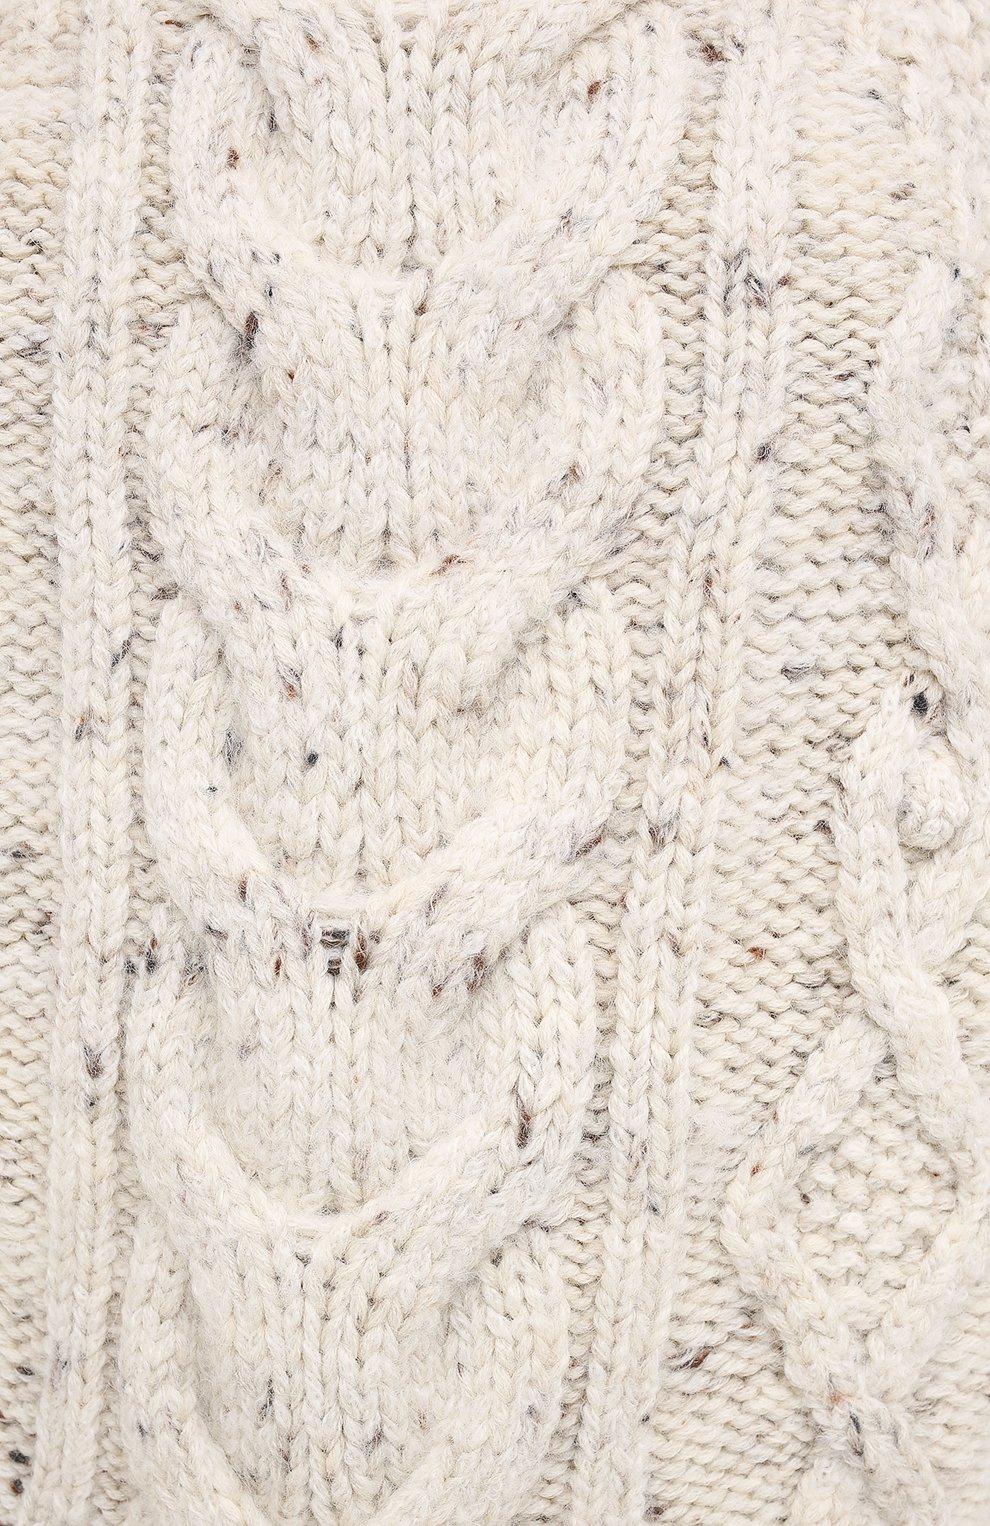 Женский шерстяной свитер ISABEL MARANT бежевого цвета, арт. PU1481-20H007I/FL0VER   Фото 5